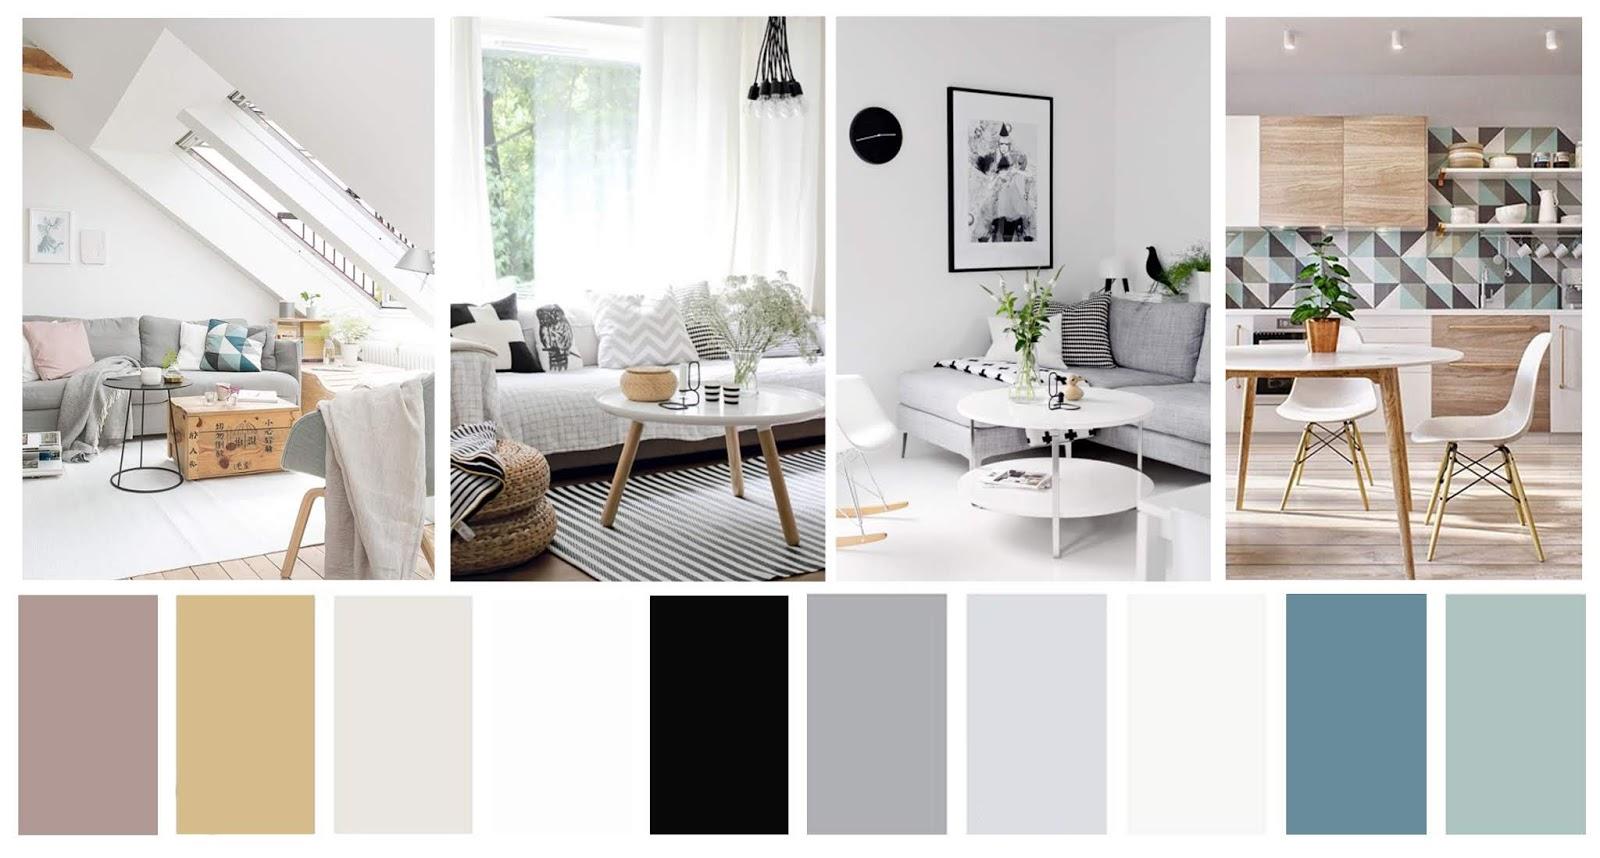 como decorar tu piso de alquiler estilo nórdico